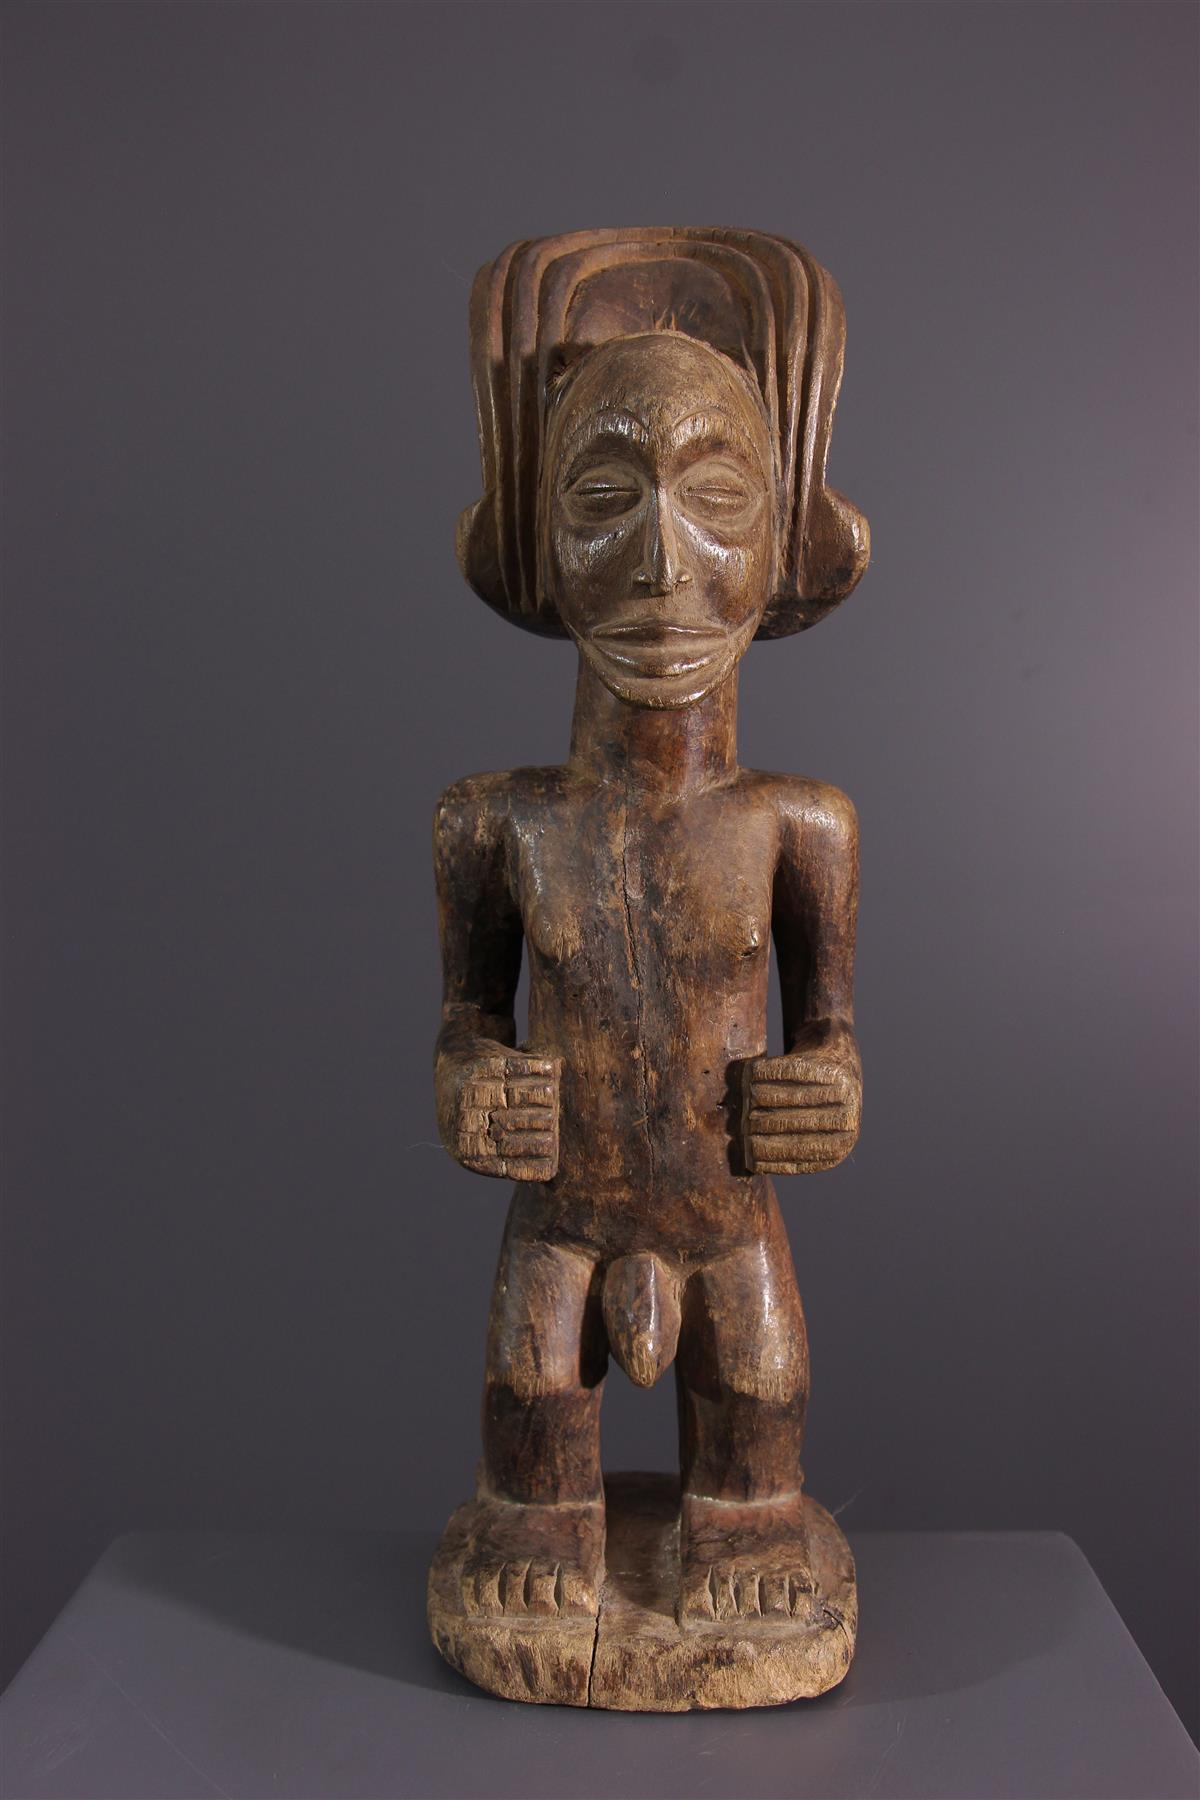 Statuette Chokwe - African art